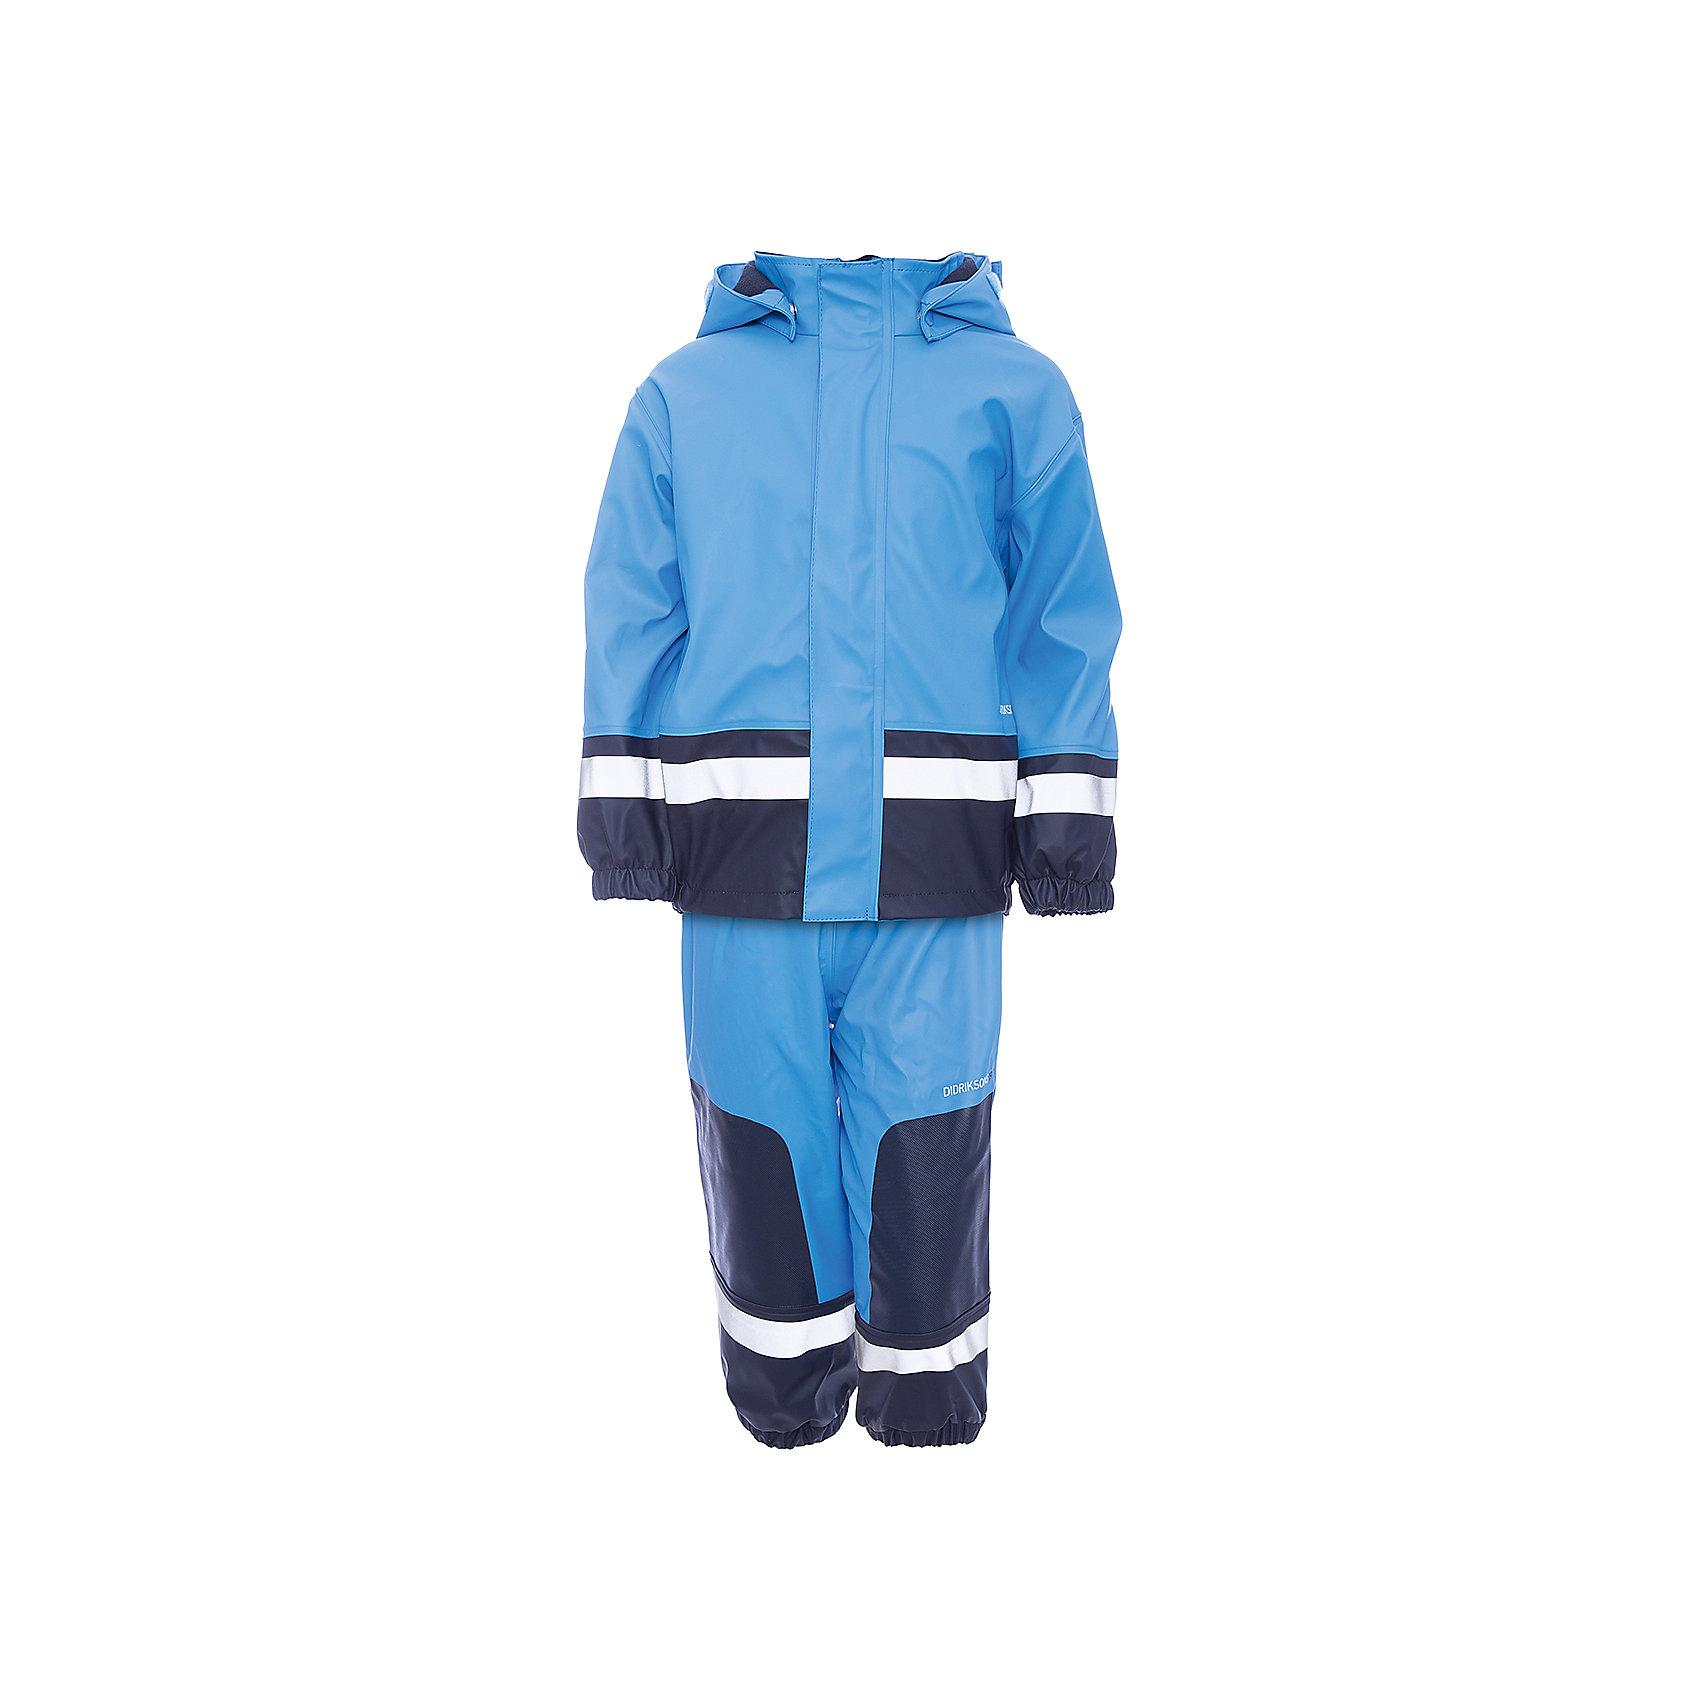 DIDRIKSONS Комплект: курта и брюки для мальчика DIDRIKSONS